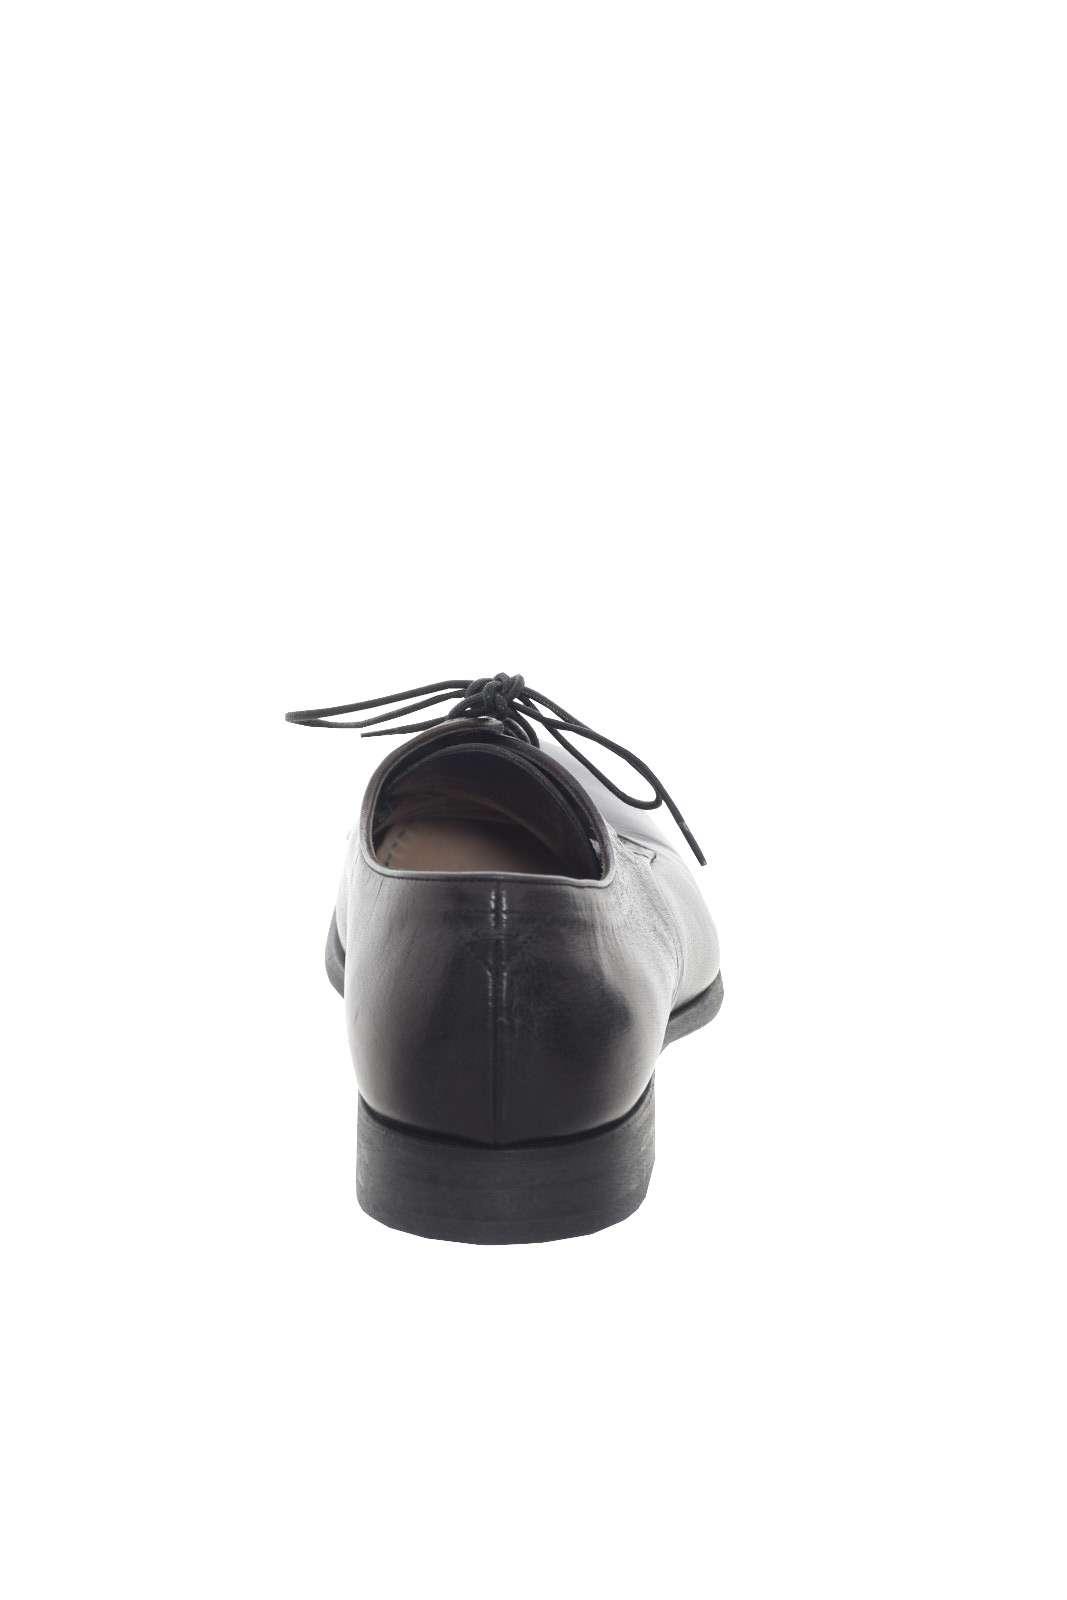 https://www.parmax.com/media/catalog/product/a/i/AI-outlet_parmax-scarpe-uomo-Pantanetti-1142-C.jpg